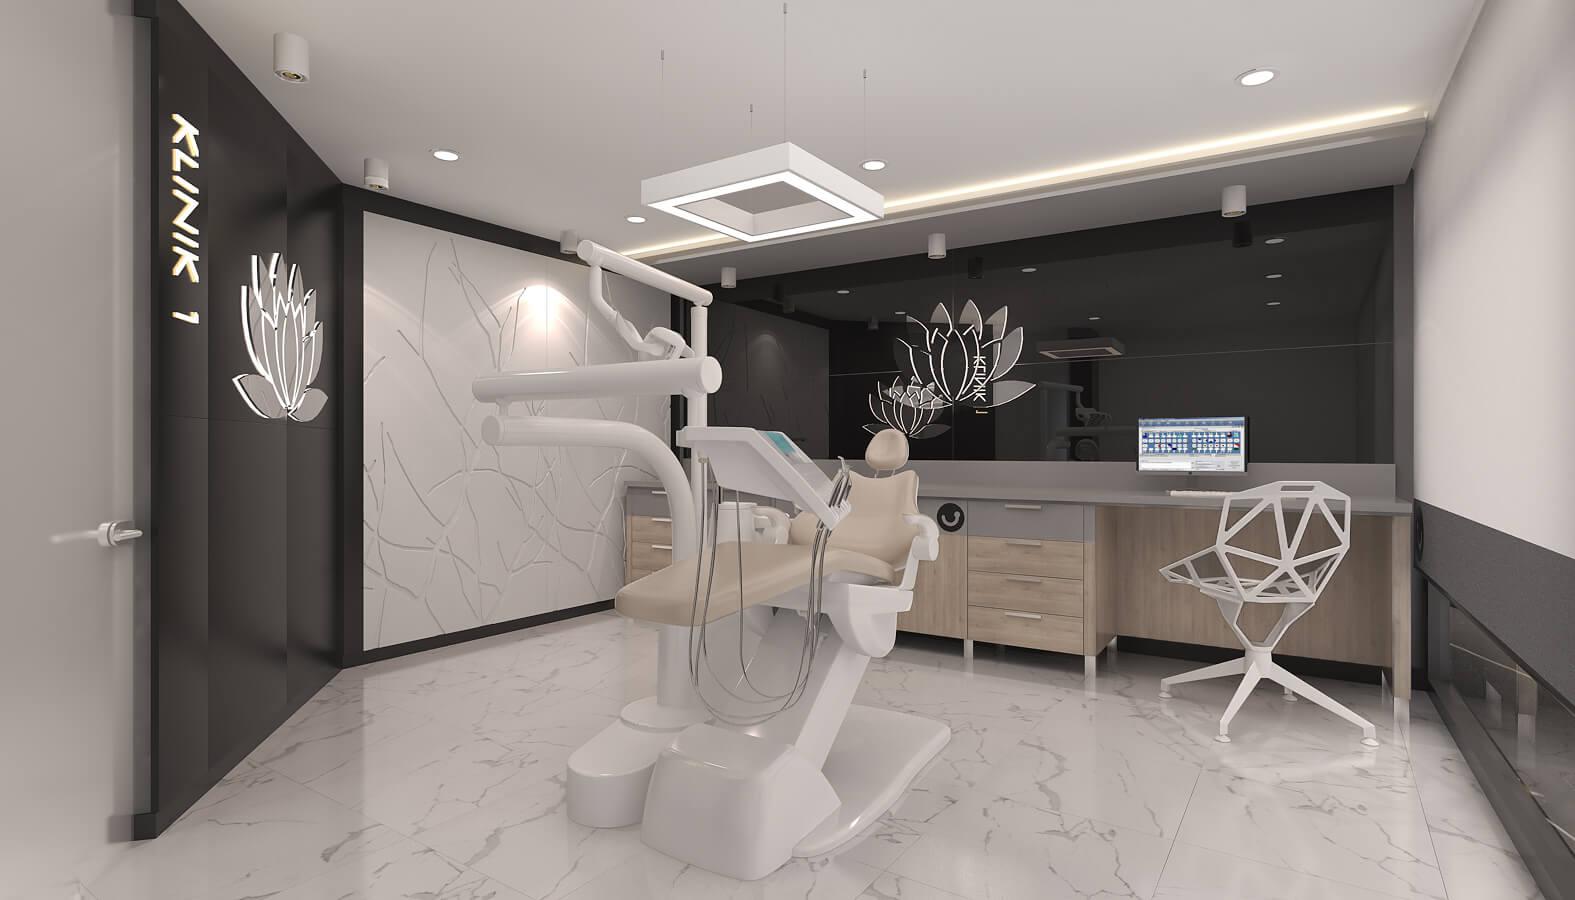 Surgery Clinic 4574 Dentapol Dental Polyclinic Healthcare